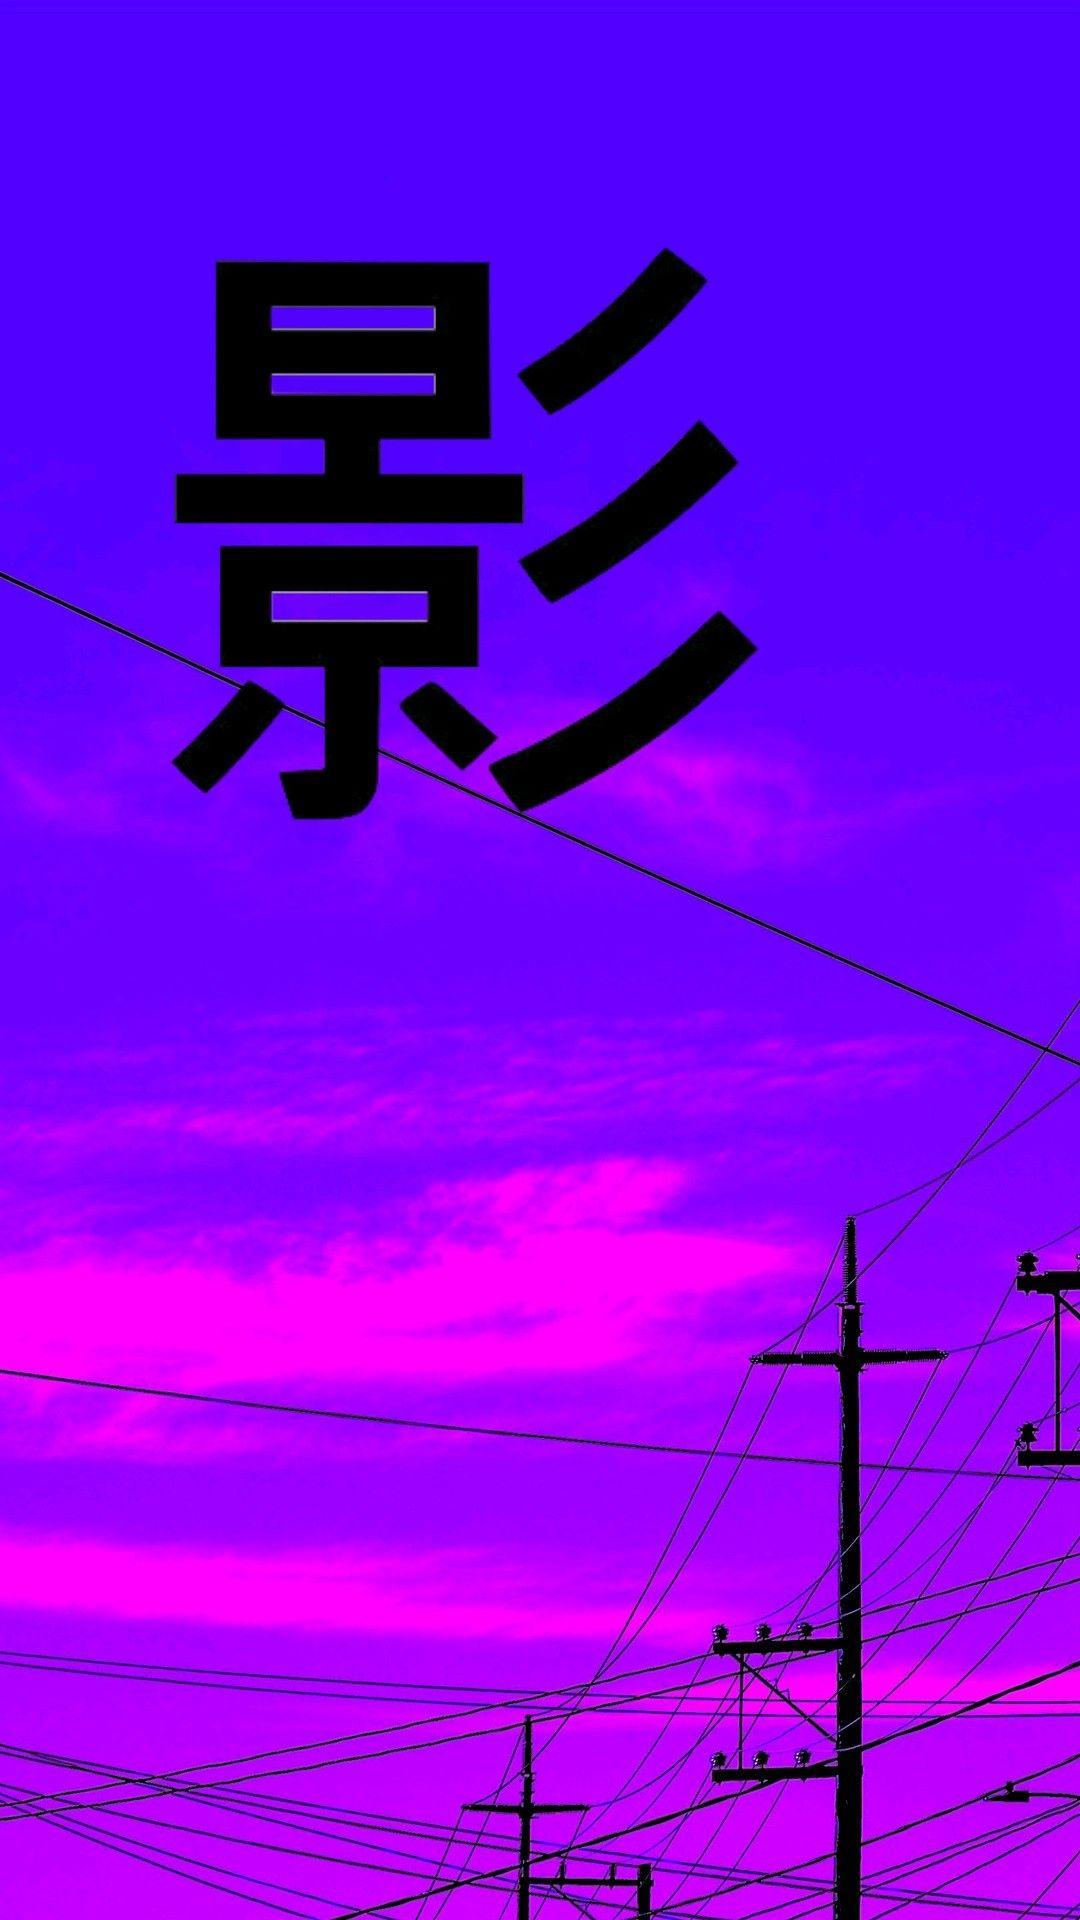 Vaporwave Phone Wallpaper 4k 1080x1920 Download Hd Wallpaper Wallpapertip